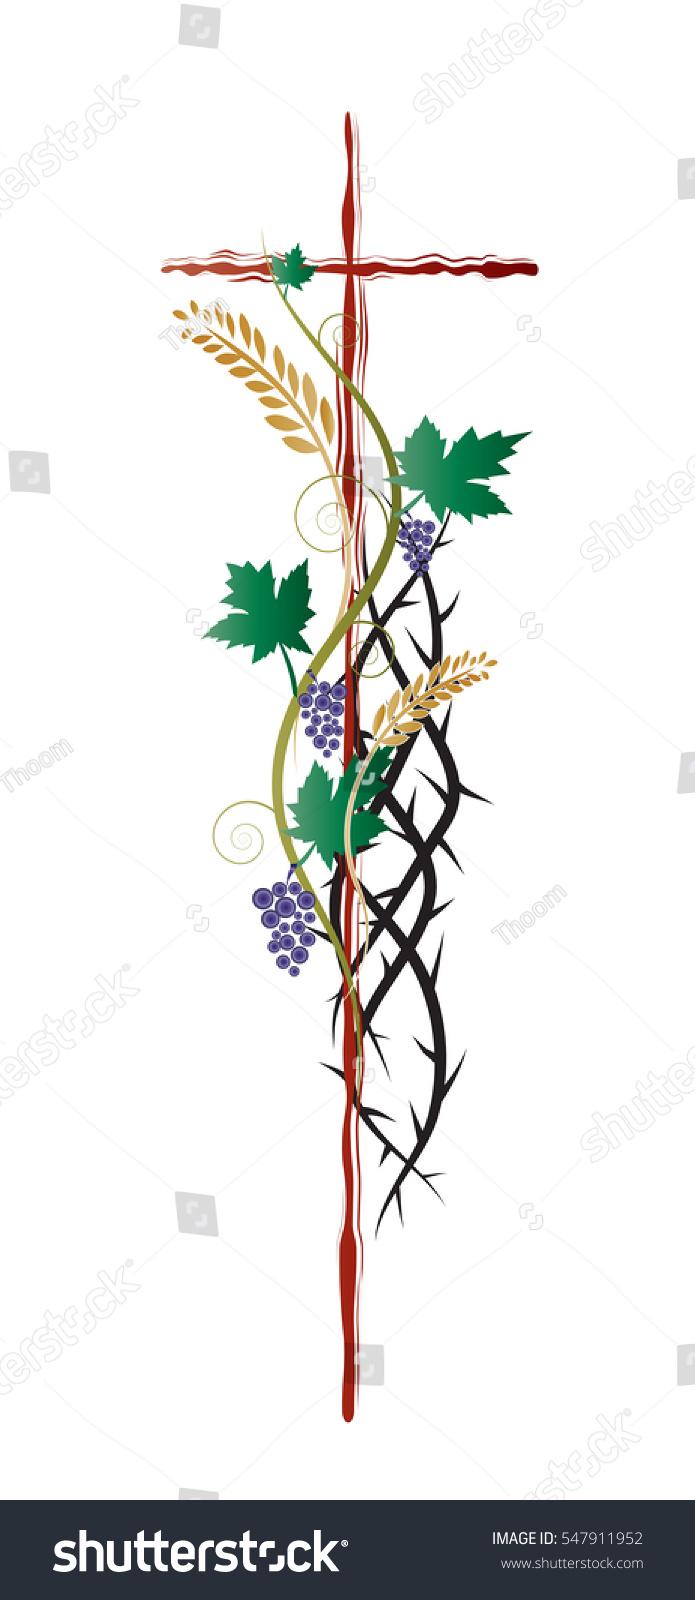 Christian Abstract Religious Illustration Cross Thorns Stock Vector